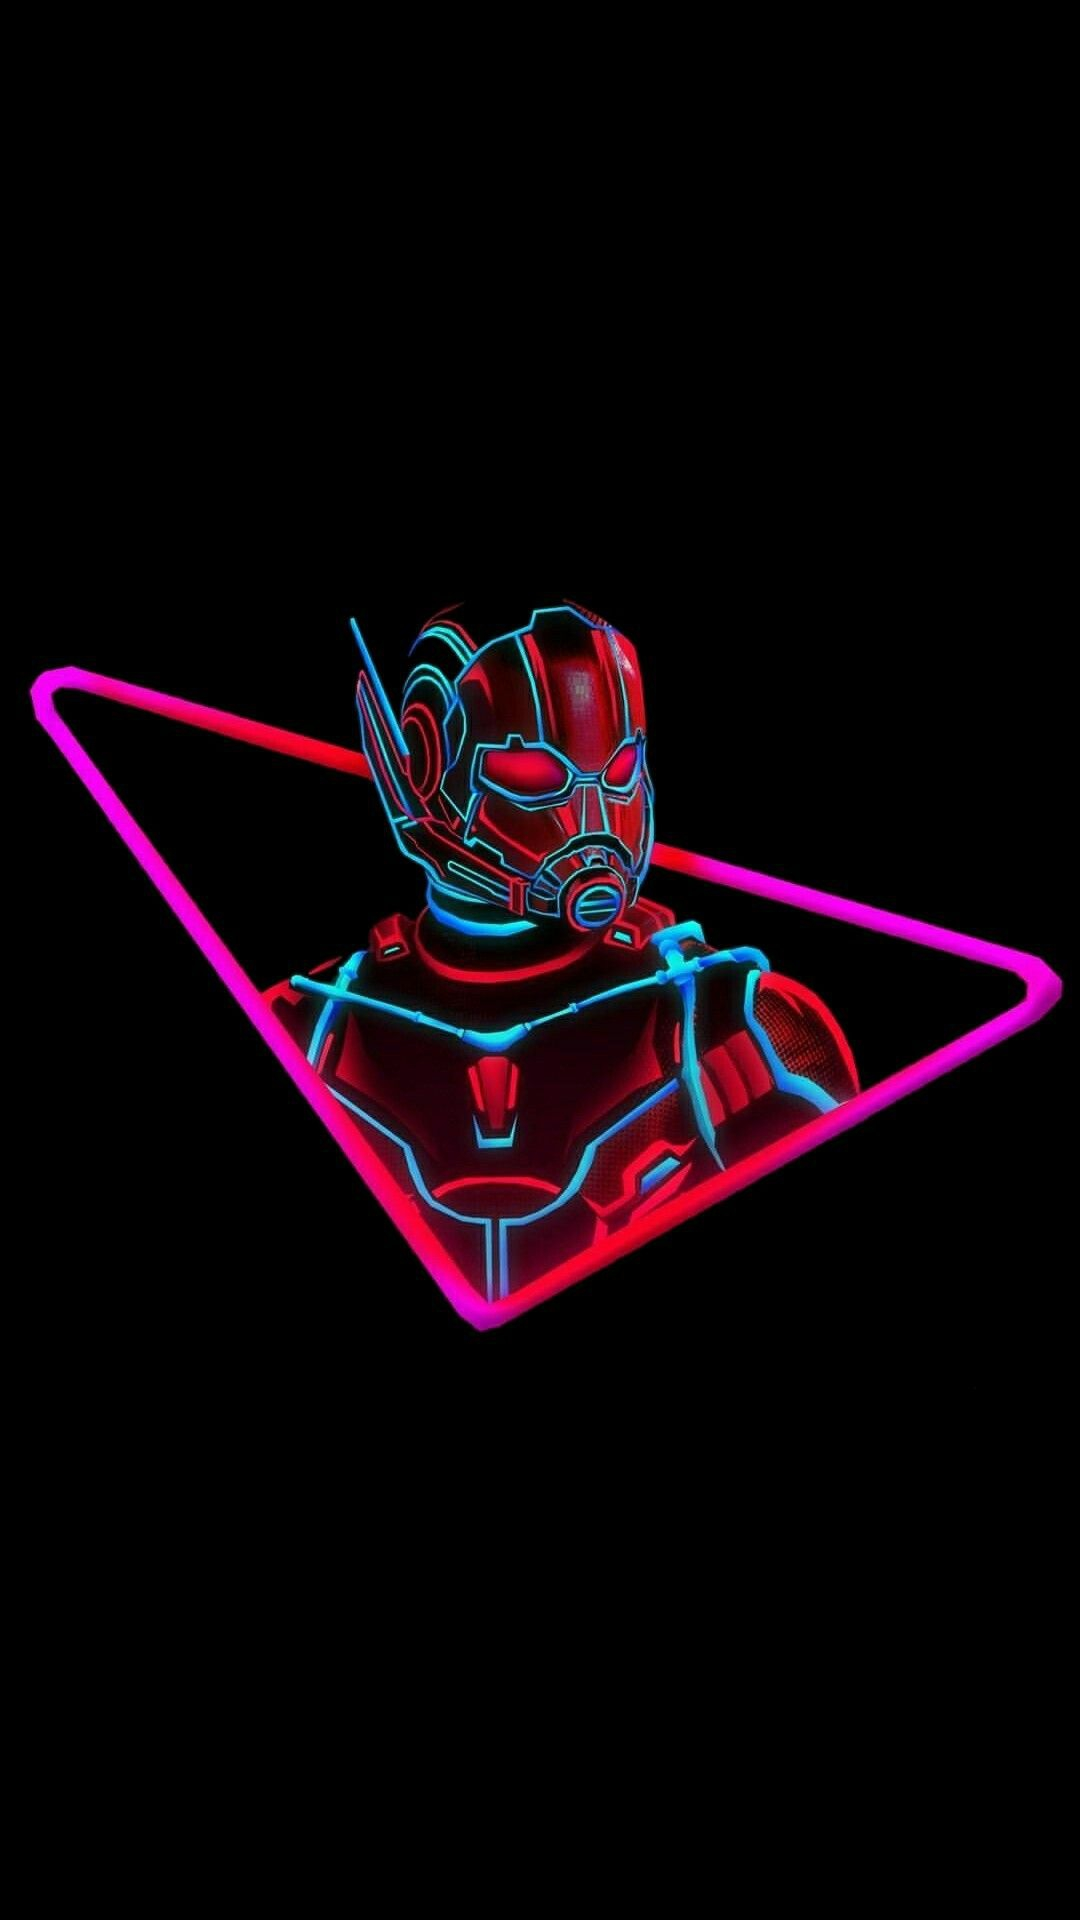 Ant Man Neon iPhone Wallpaper